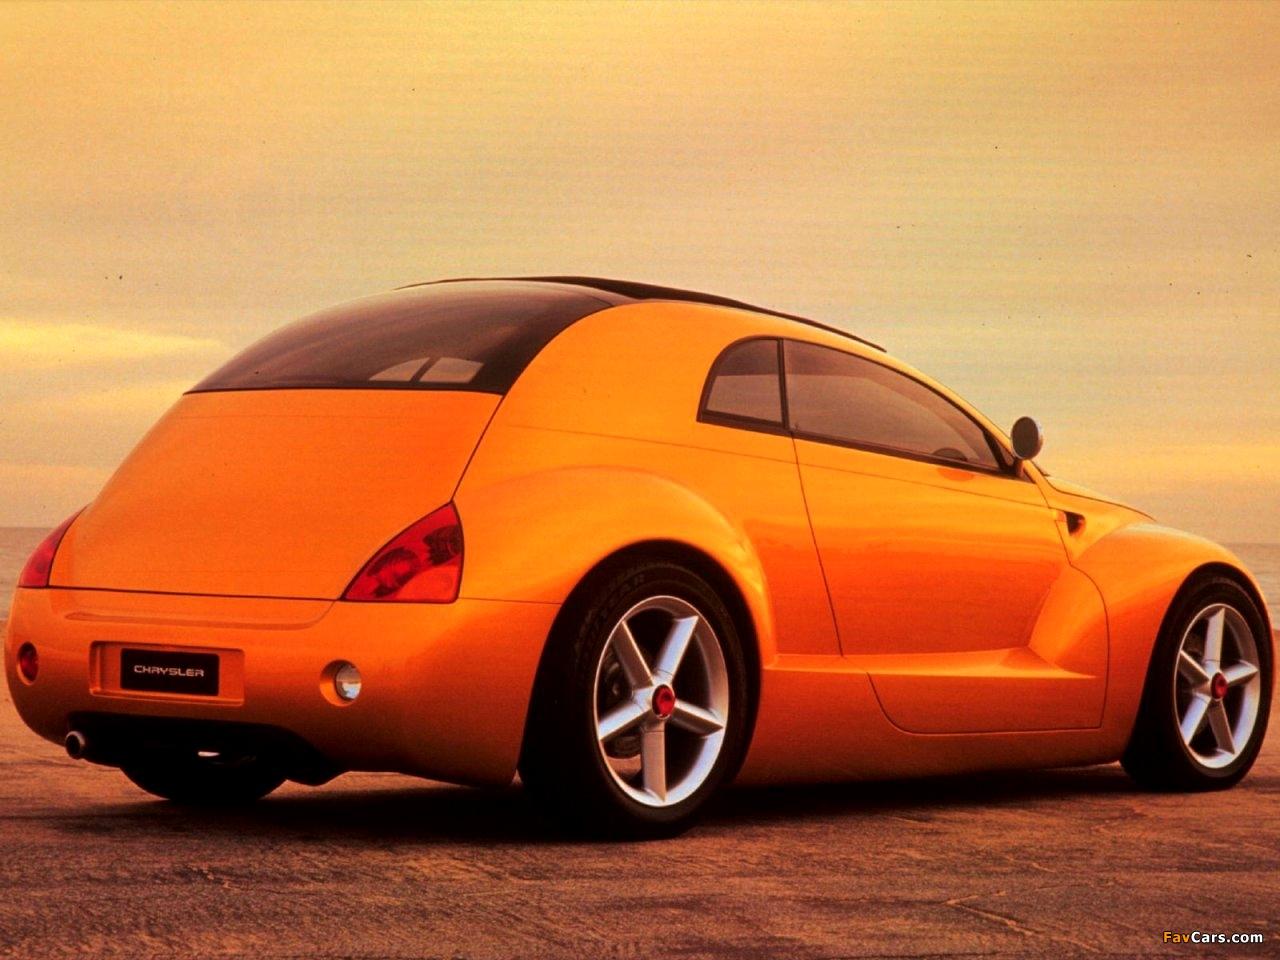 Chrysler Pronto Cruizer Concept 1999 pictures (1280 x 960)